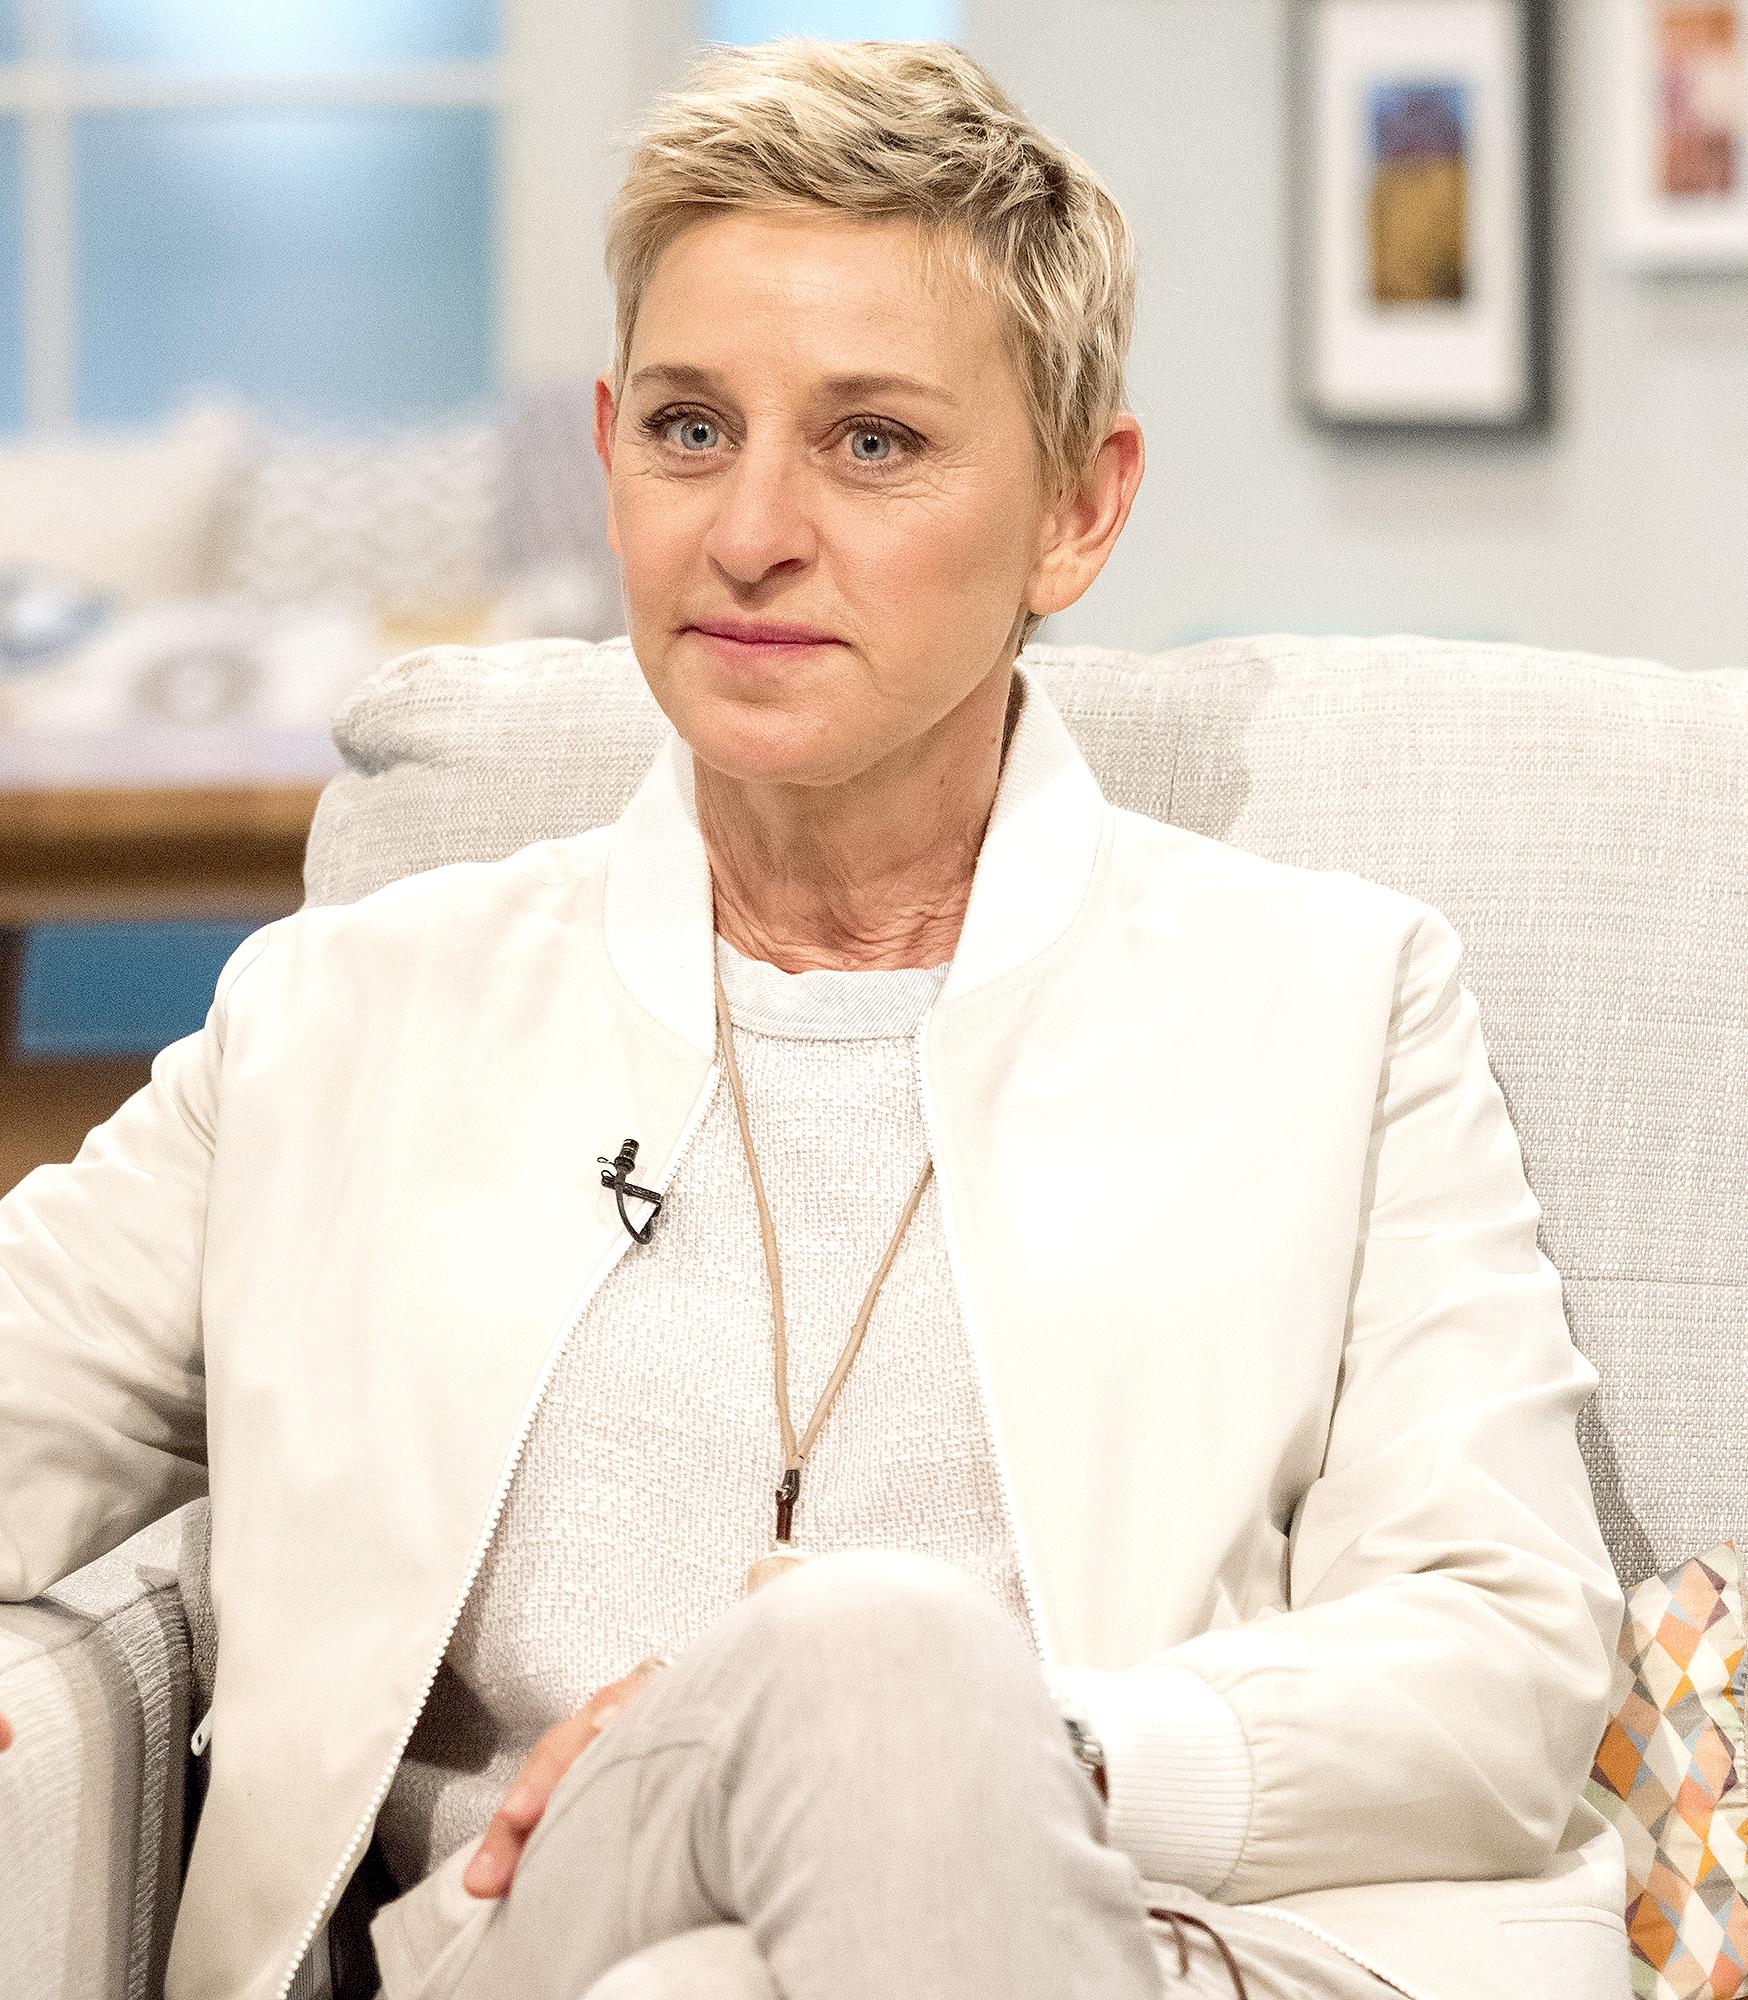 Ellen DeGeneres' Most Controversial Moments Over the Years